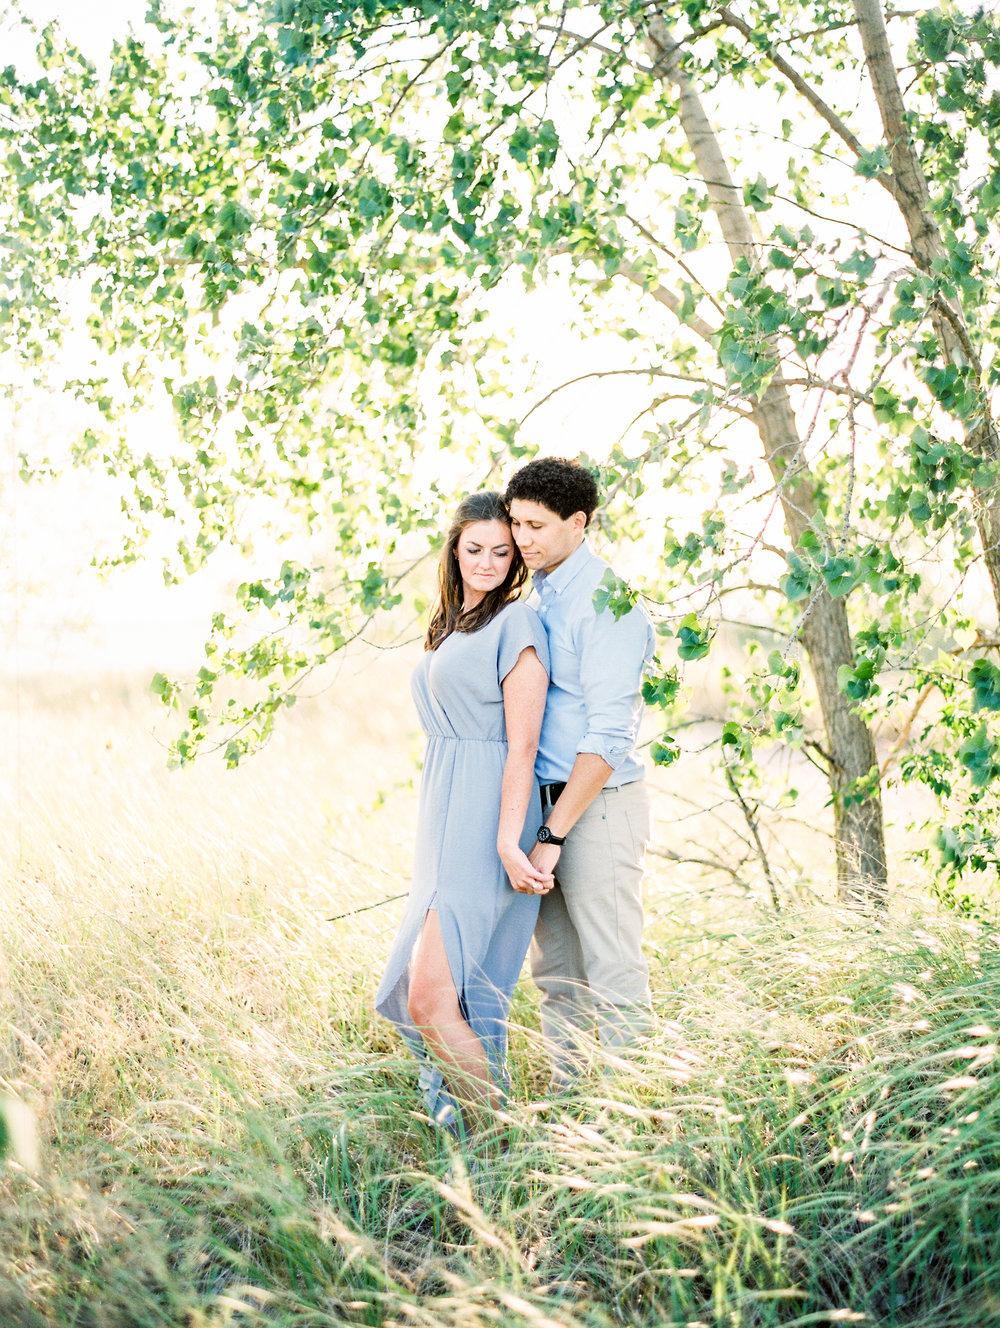 Lucie+Anthony+Engaged-27.jpg